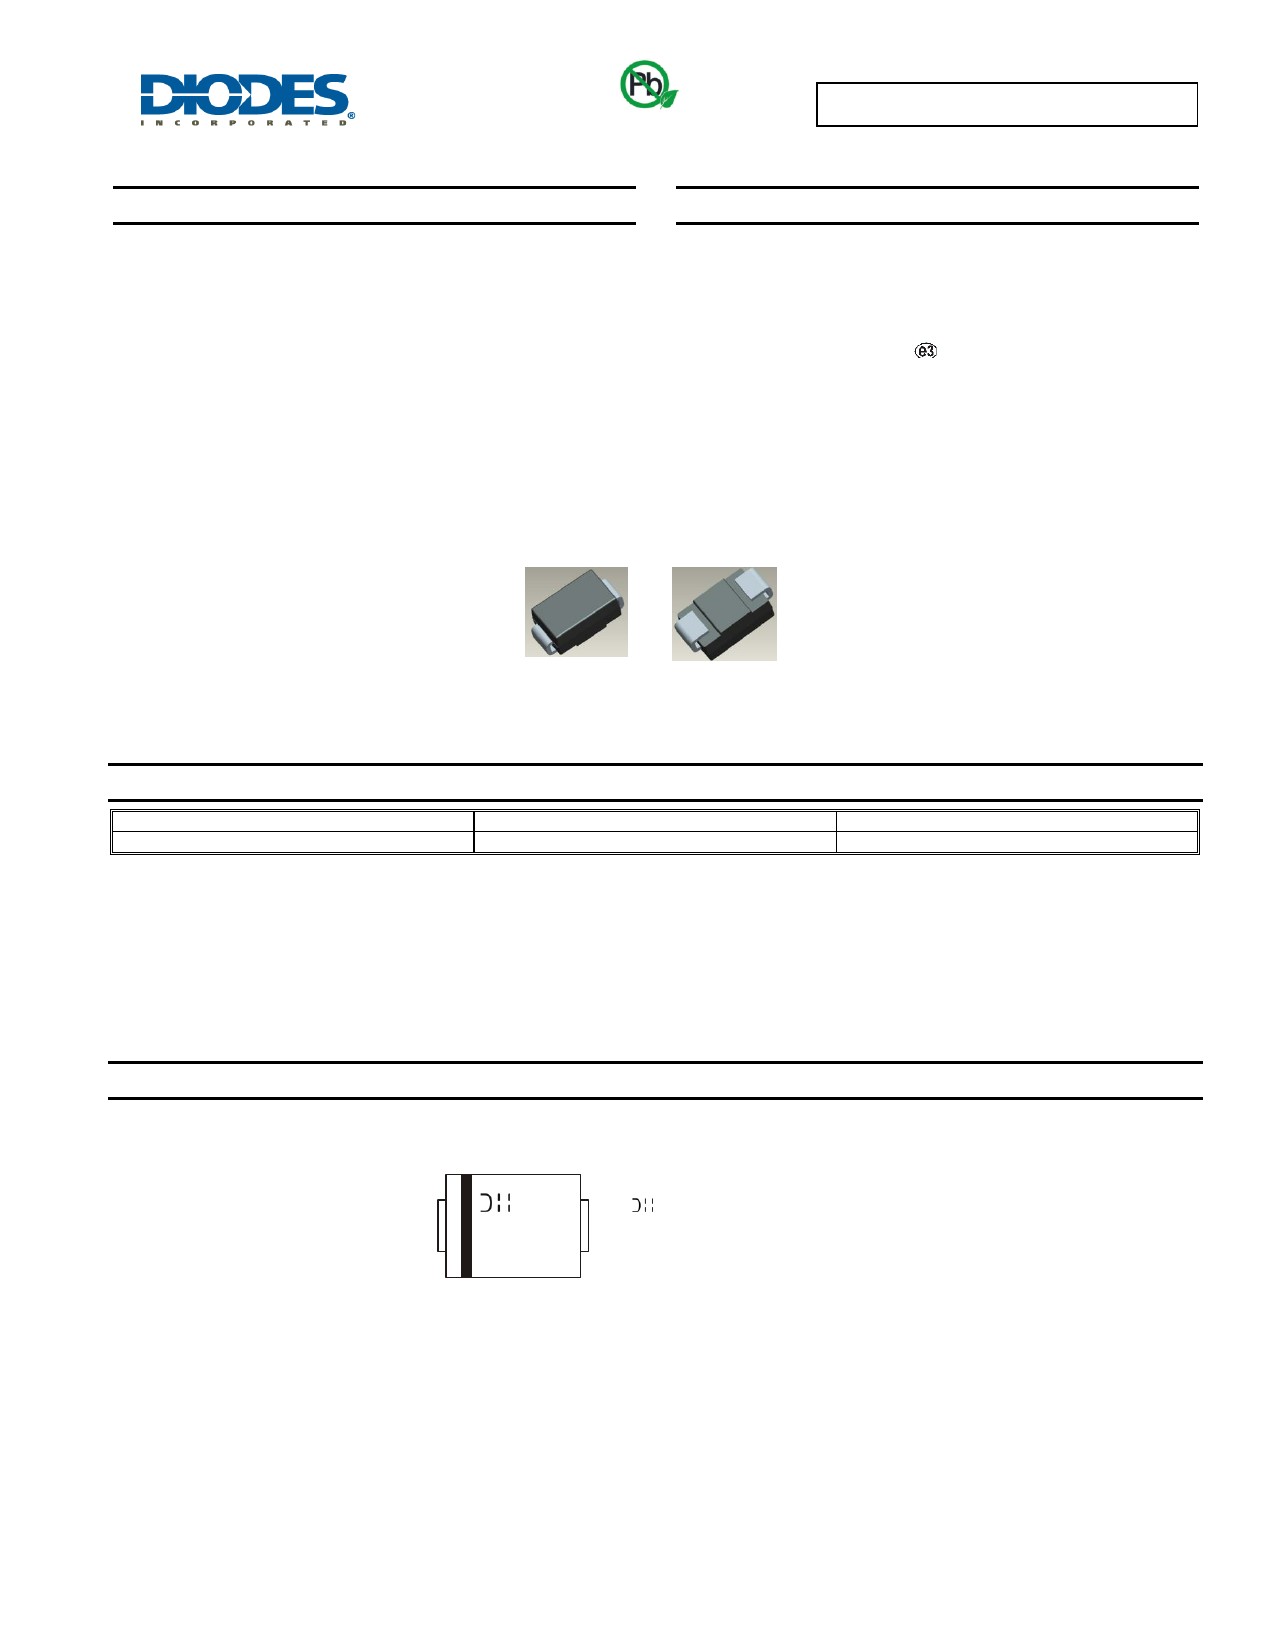 SMCJ90CA datasheet